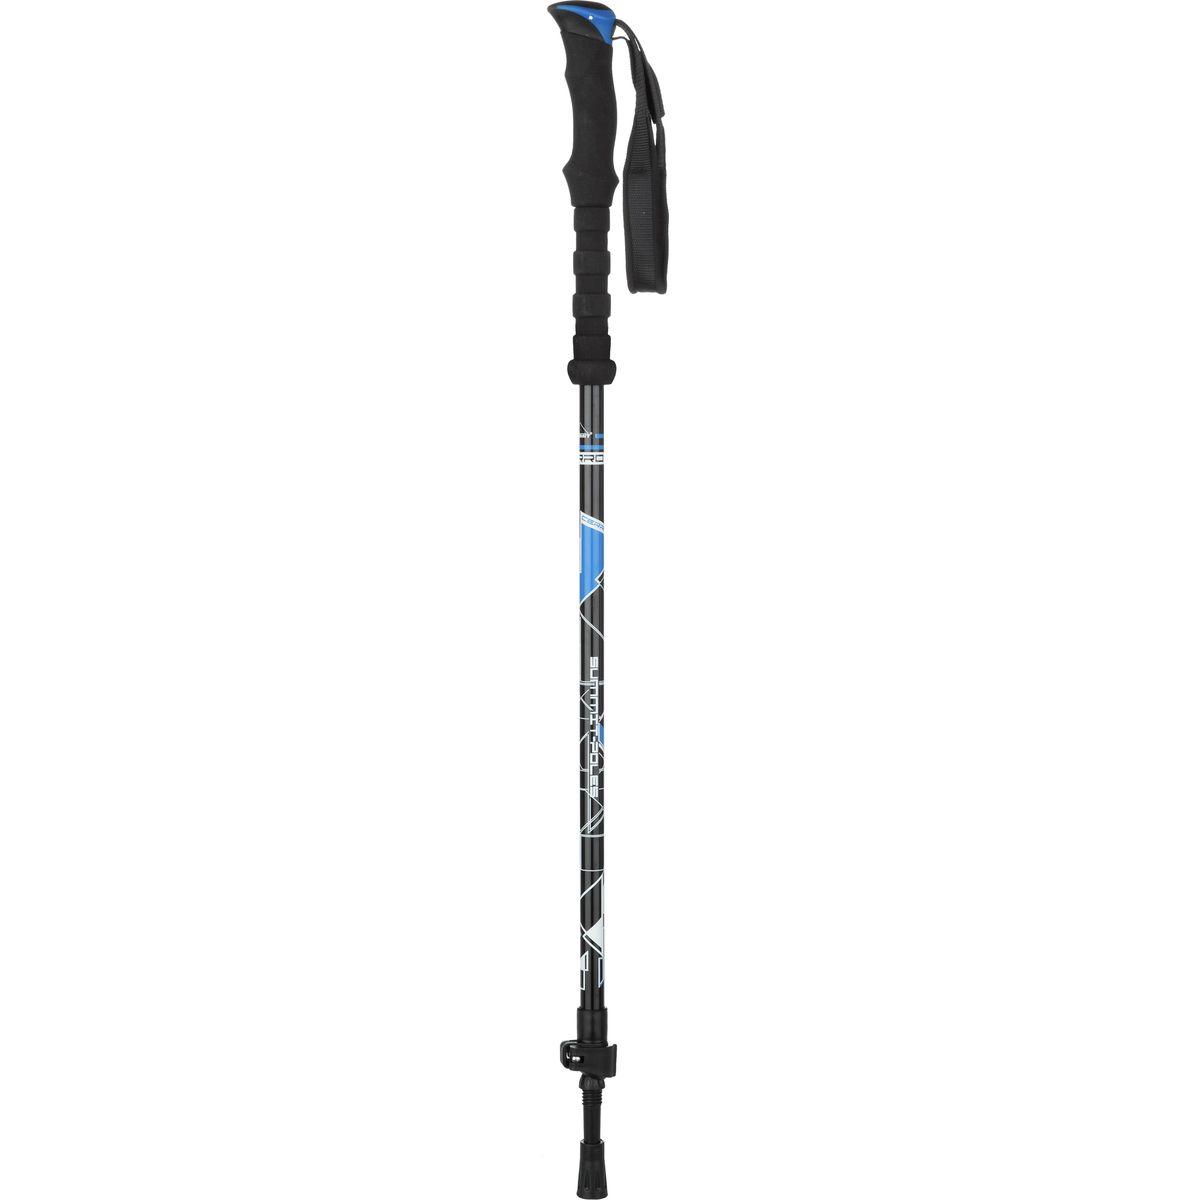 Arva Cerro Ski Pole Powerlock